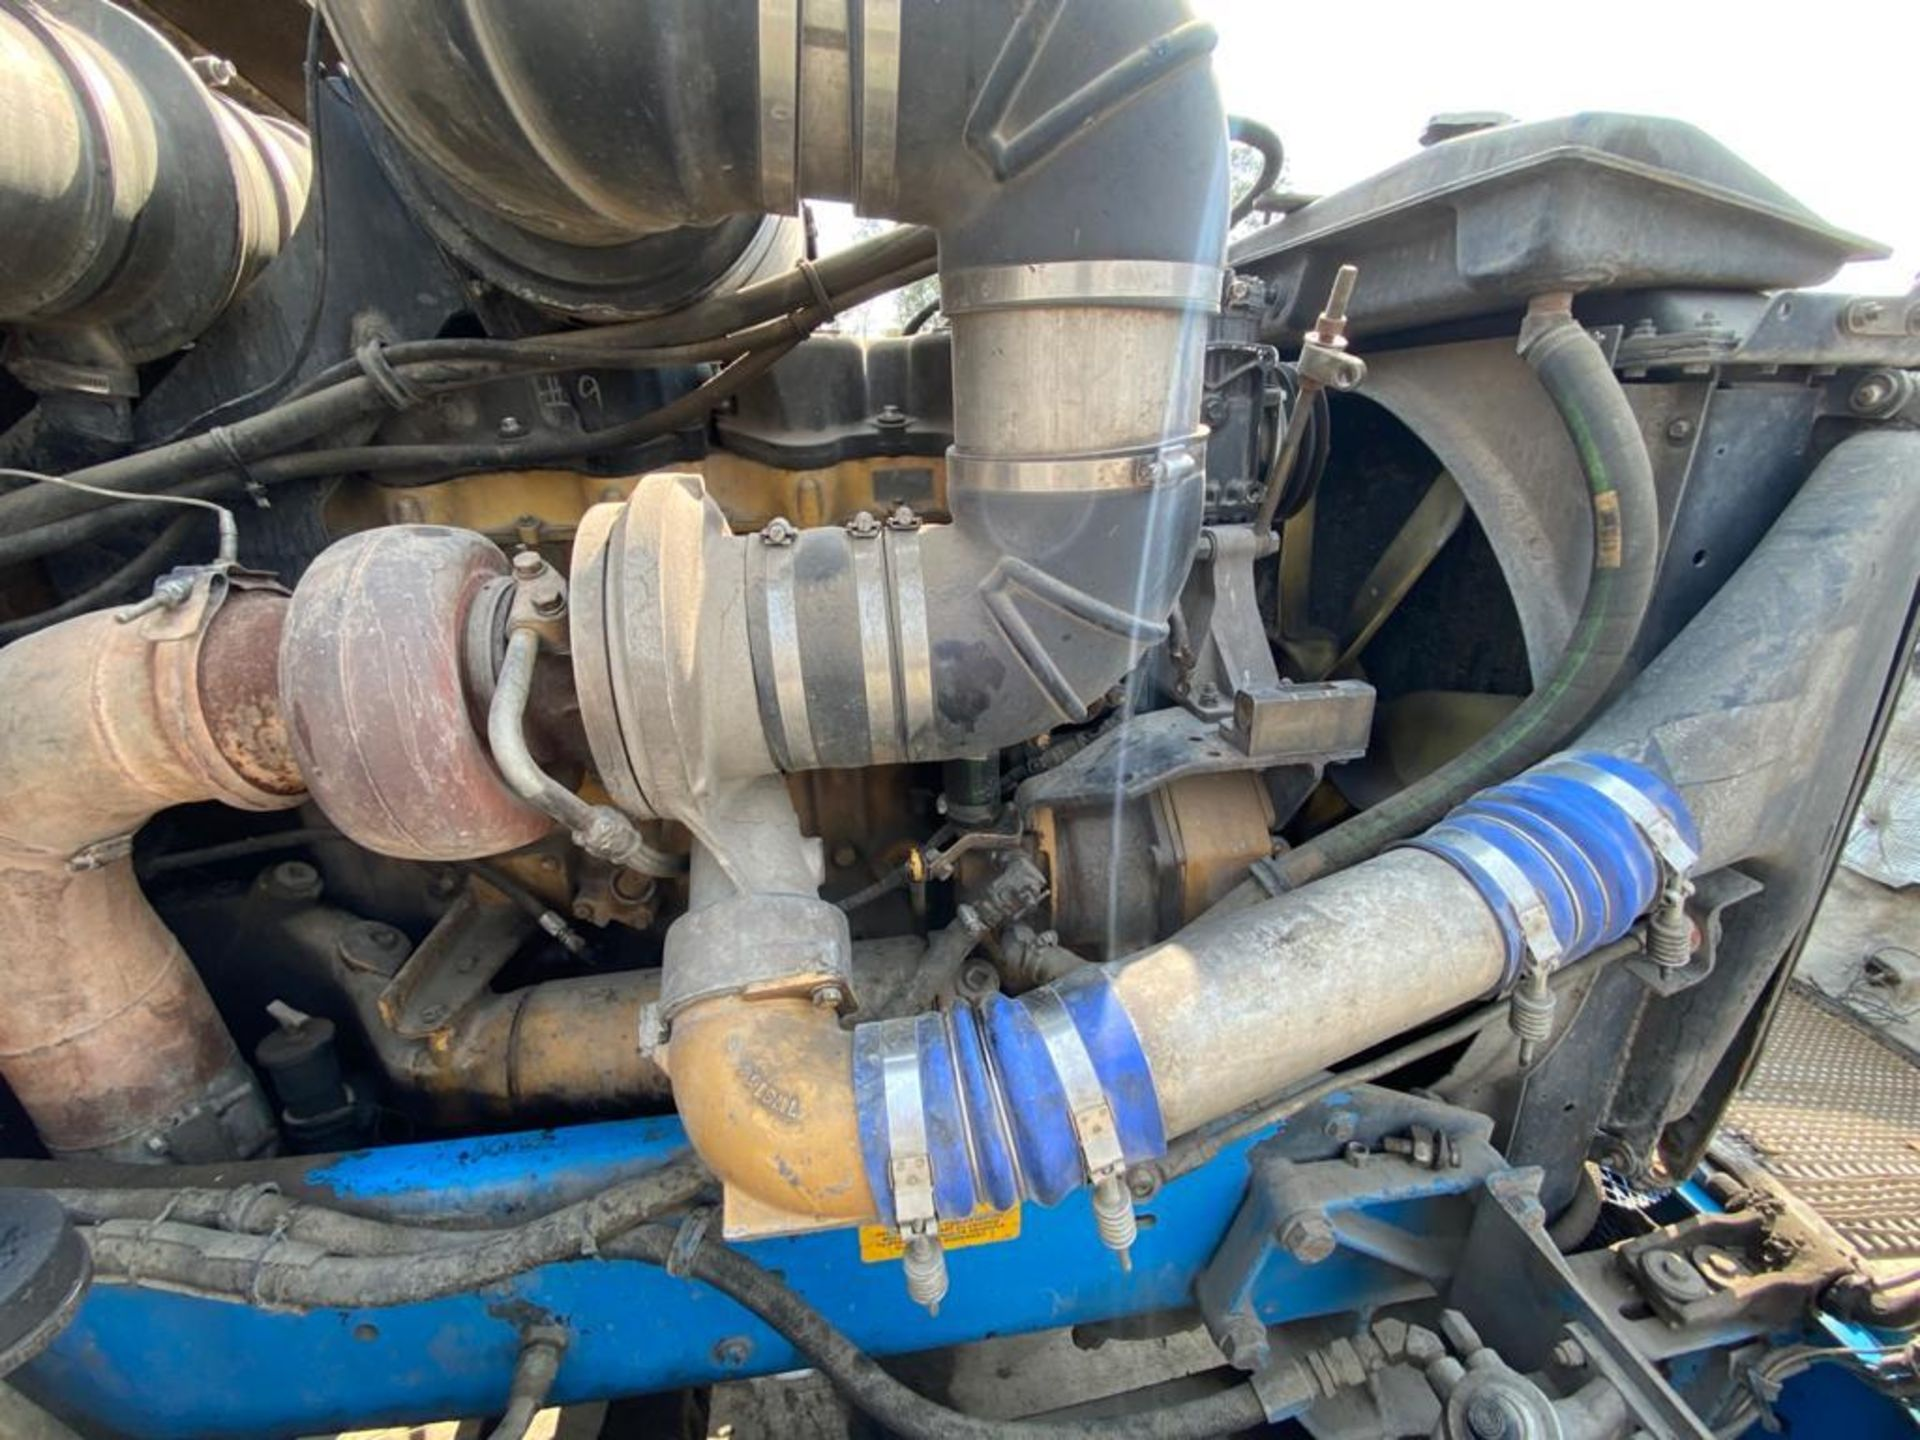 1999 Kenworth Sleeper truck tractor, standard transmission of 18 speeds - Image 74 of 75